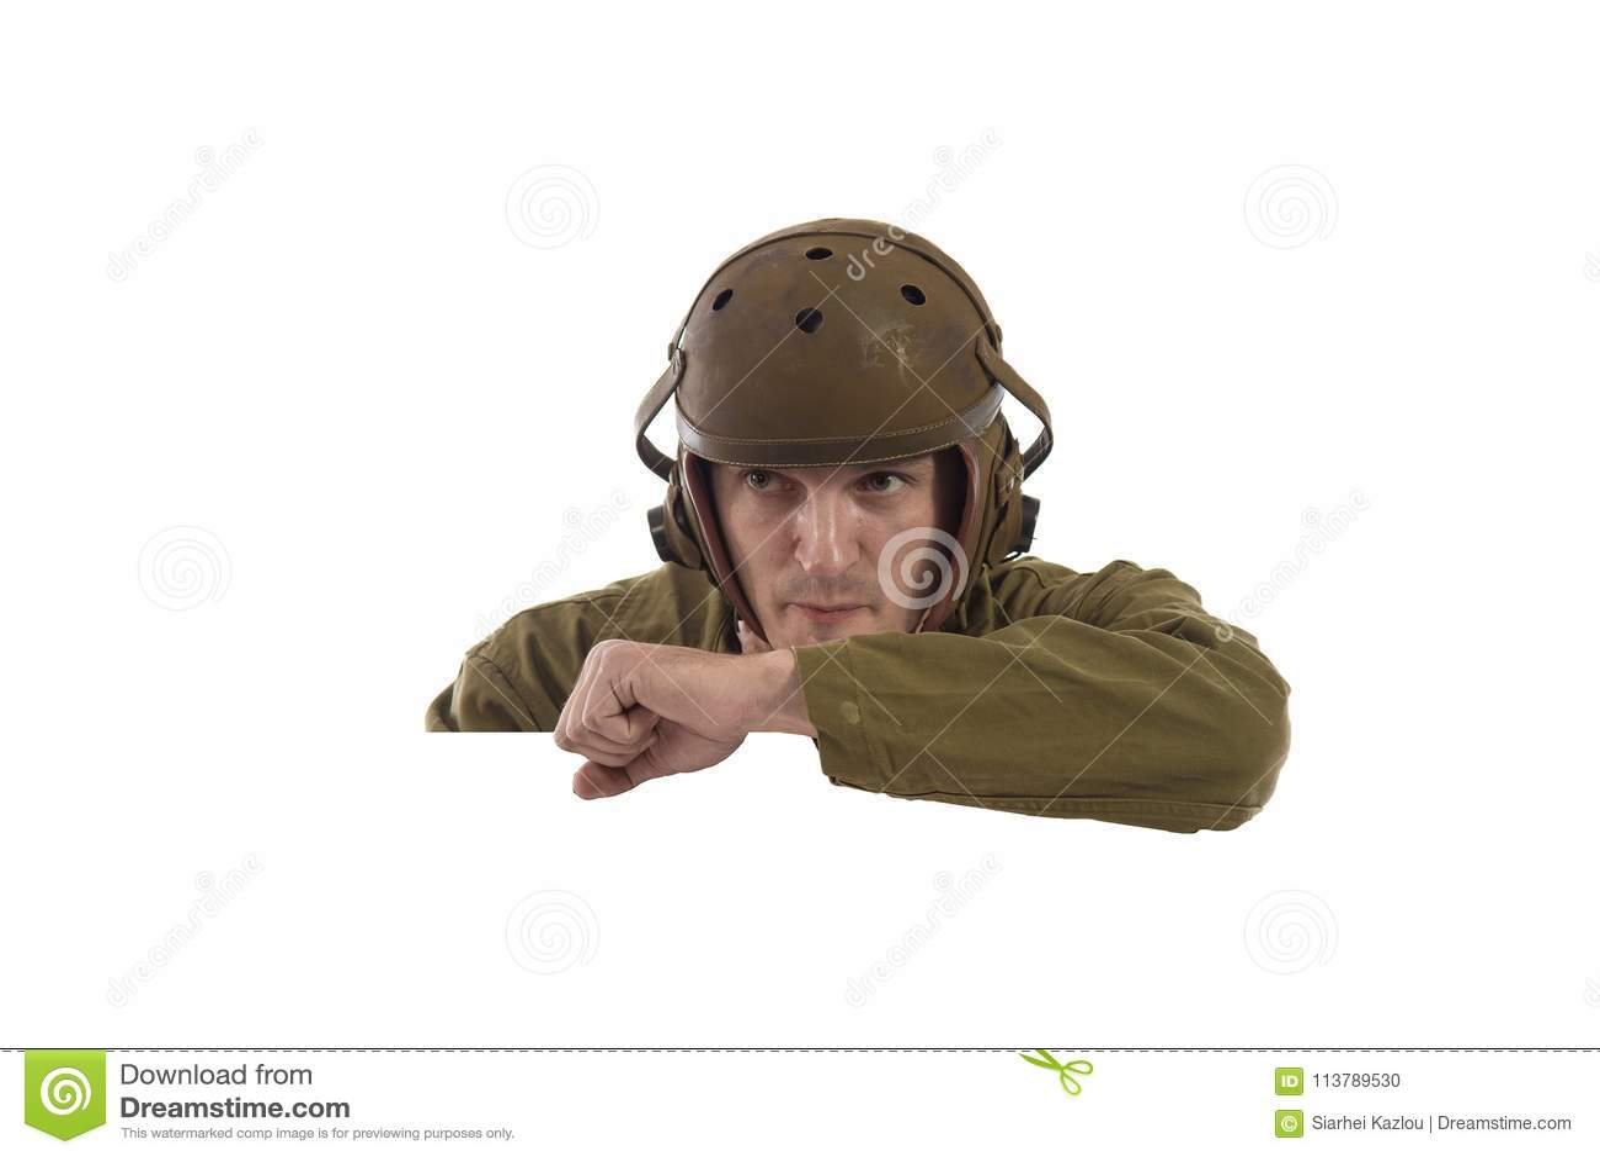 Man actor in military uniform of American tankman of World War II